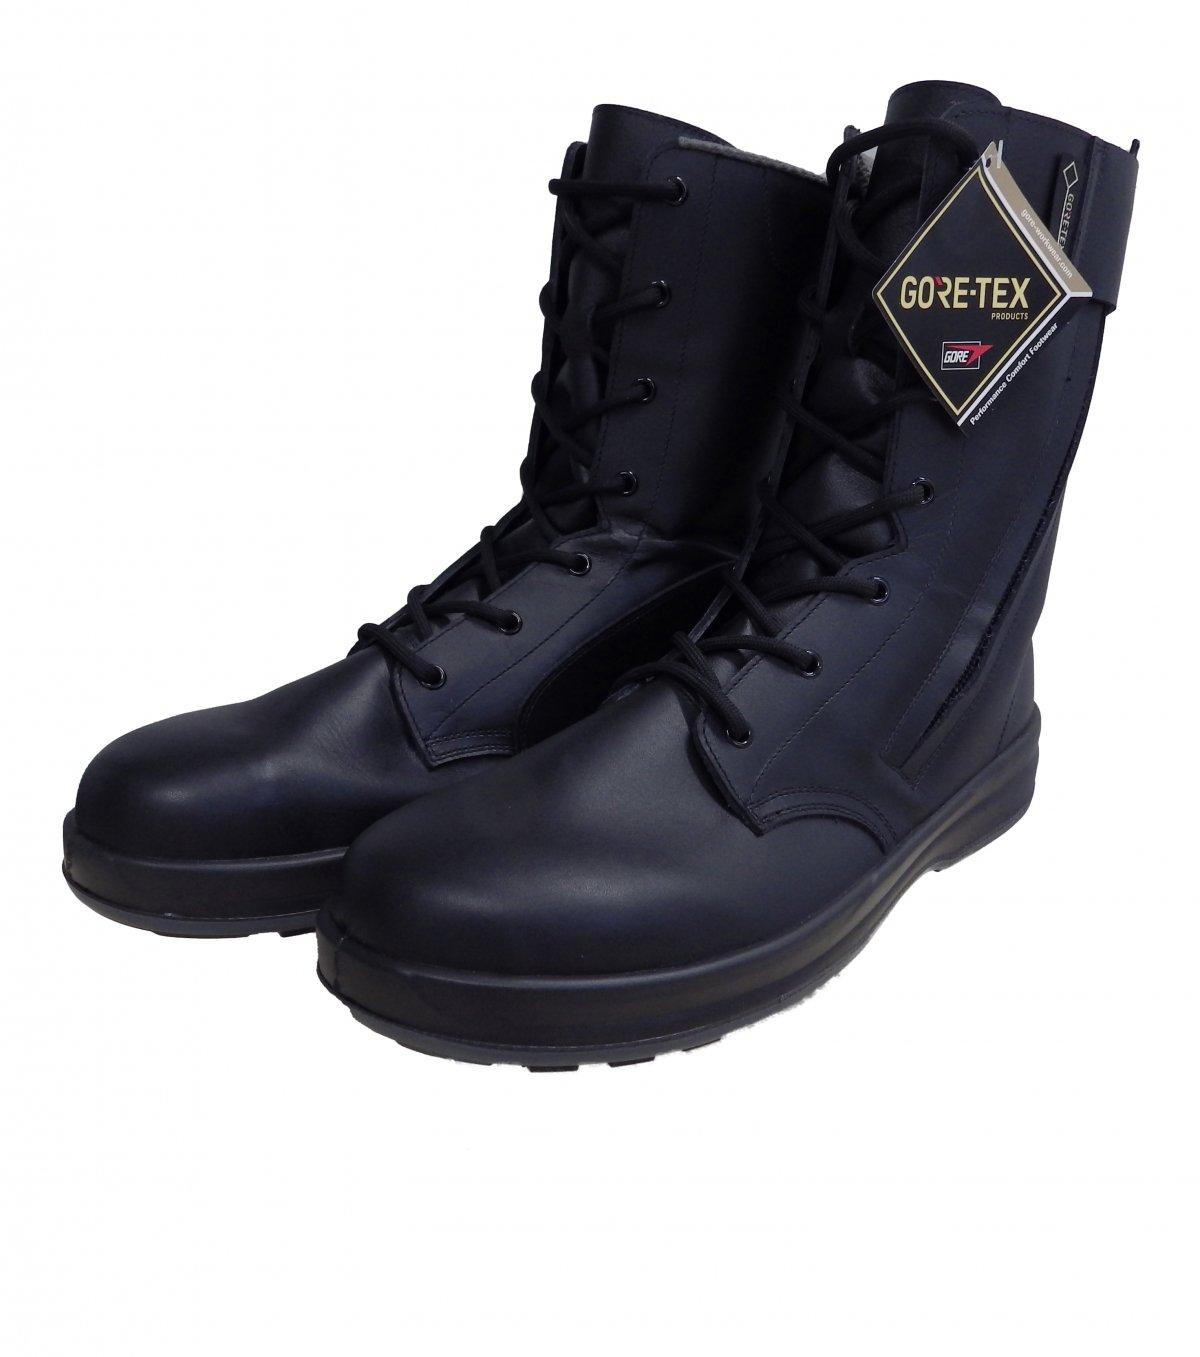 GORE-TEX 編上活動靴 WS33HiFR【画像5】